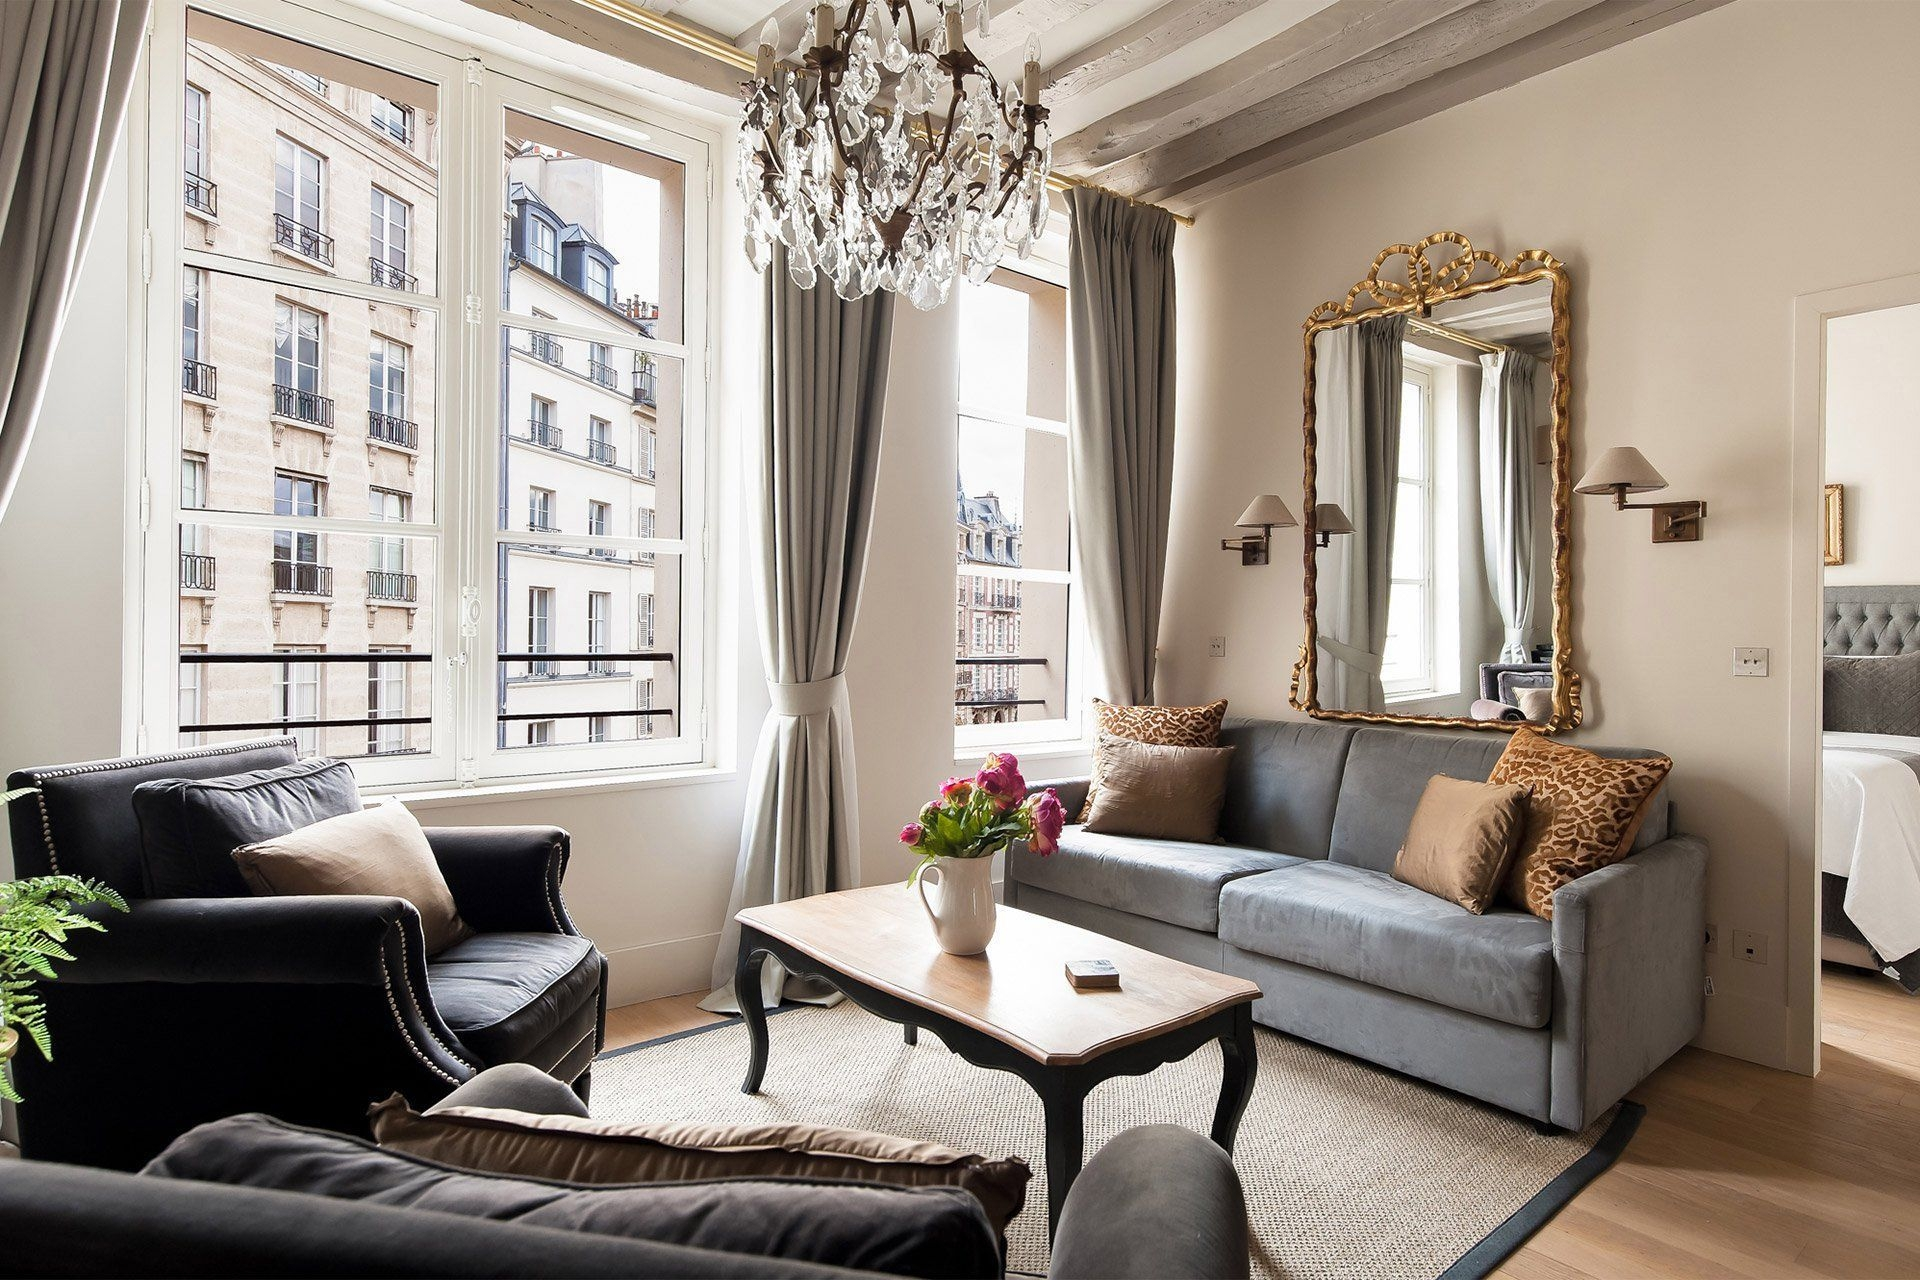 Astonishing Rental Apartment Decorating Ideas 25